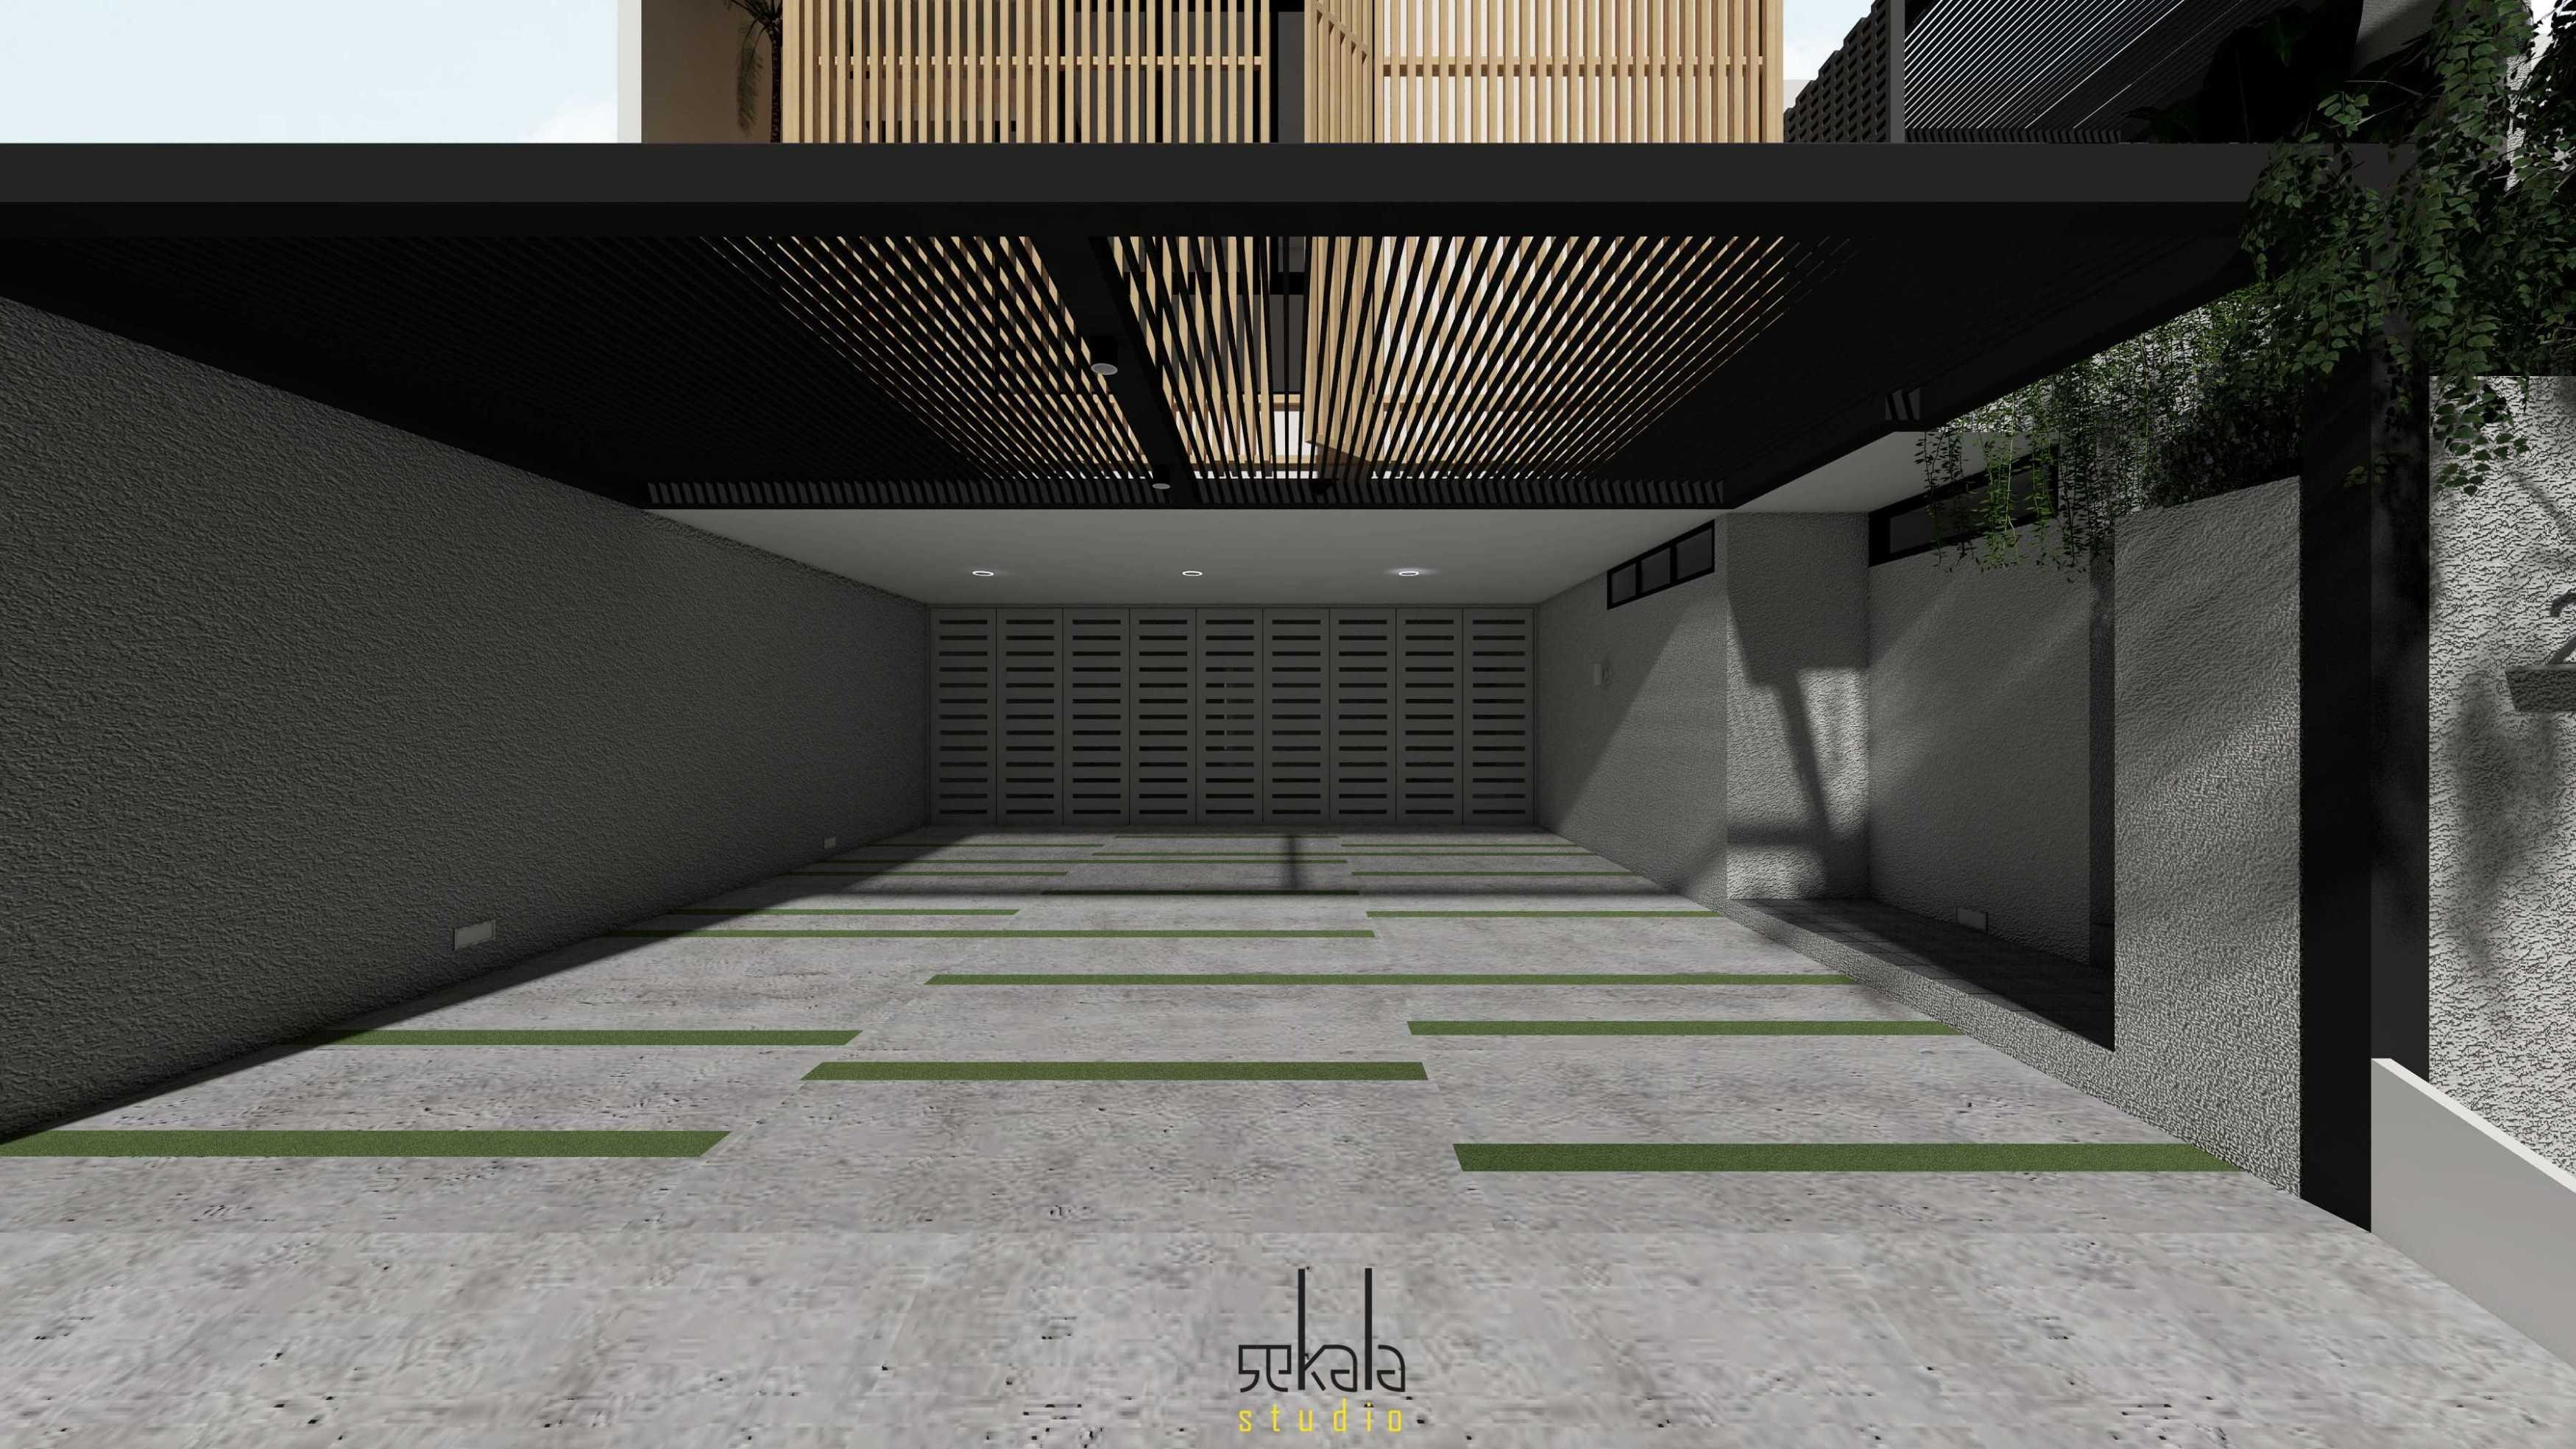 Sekala Basic Shape House Surabaya, Kota Sby, Jawa Timur, Indonesia Jl. Bumi Marina Emas Utara No.ii, Keputih, Kec. Sukolilo, Kota Sby, Jawa Timur 60111, Indonesia Sekala-Rumah-Keputih  <P>A House With 2 Floor.&nbsp;</p> <P>Size Of Land : 12X20M</p> <P>Size Of Area ; 450M2</p> <P>Natural Colour ; White, Grey, Unfinished, Wood Texture,&nbsp;</p> <P>With Variety Of Plants And Trees</p> 81713